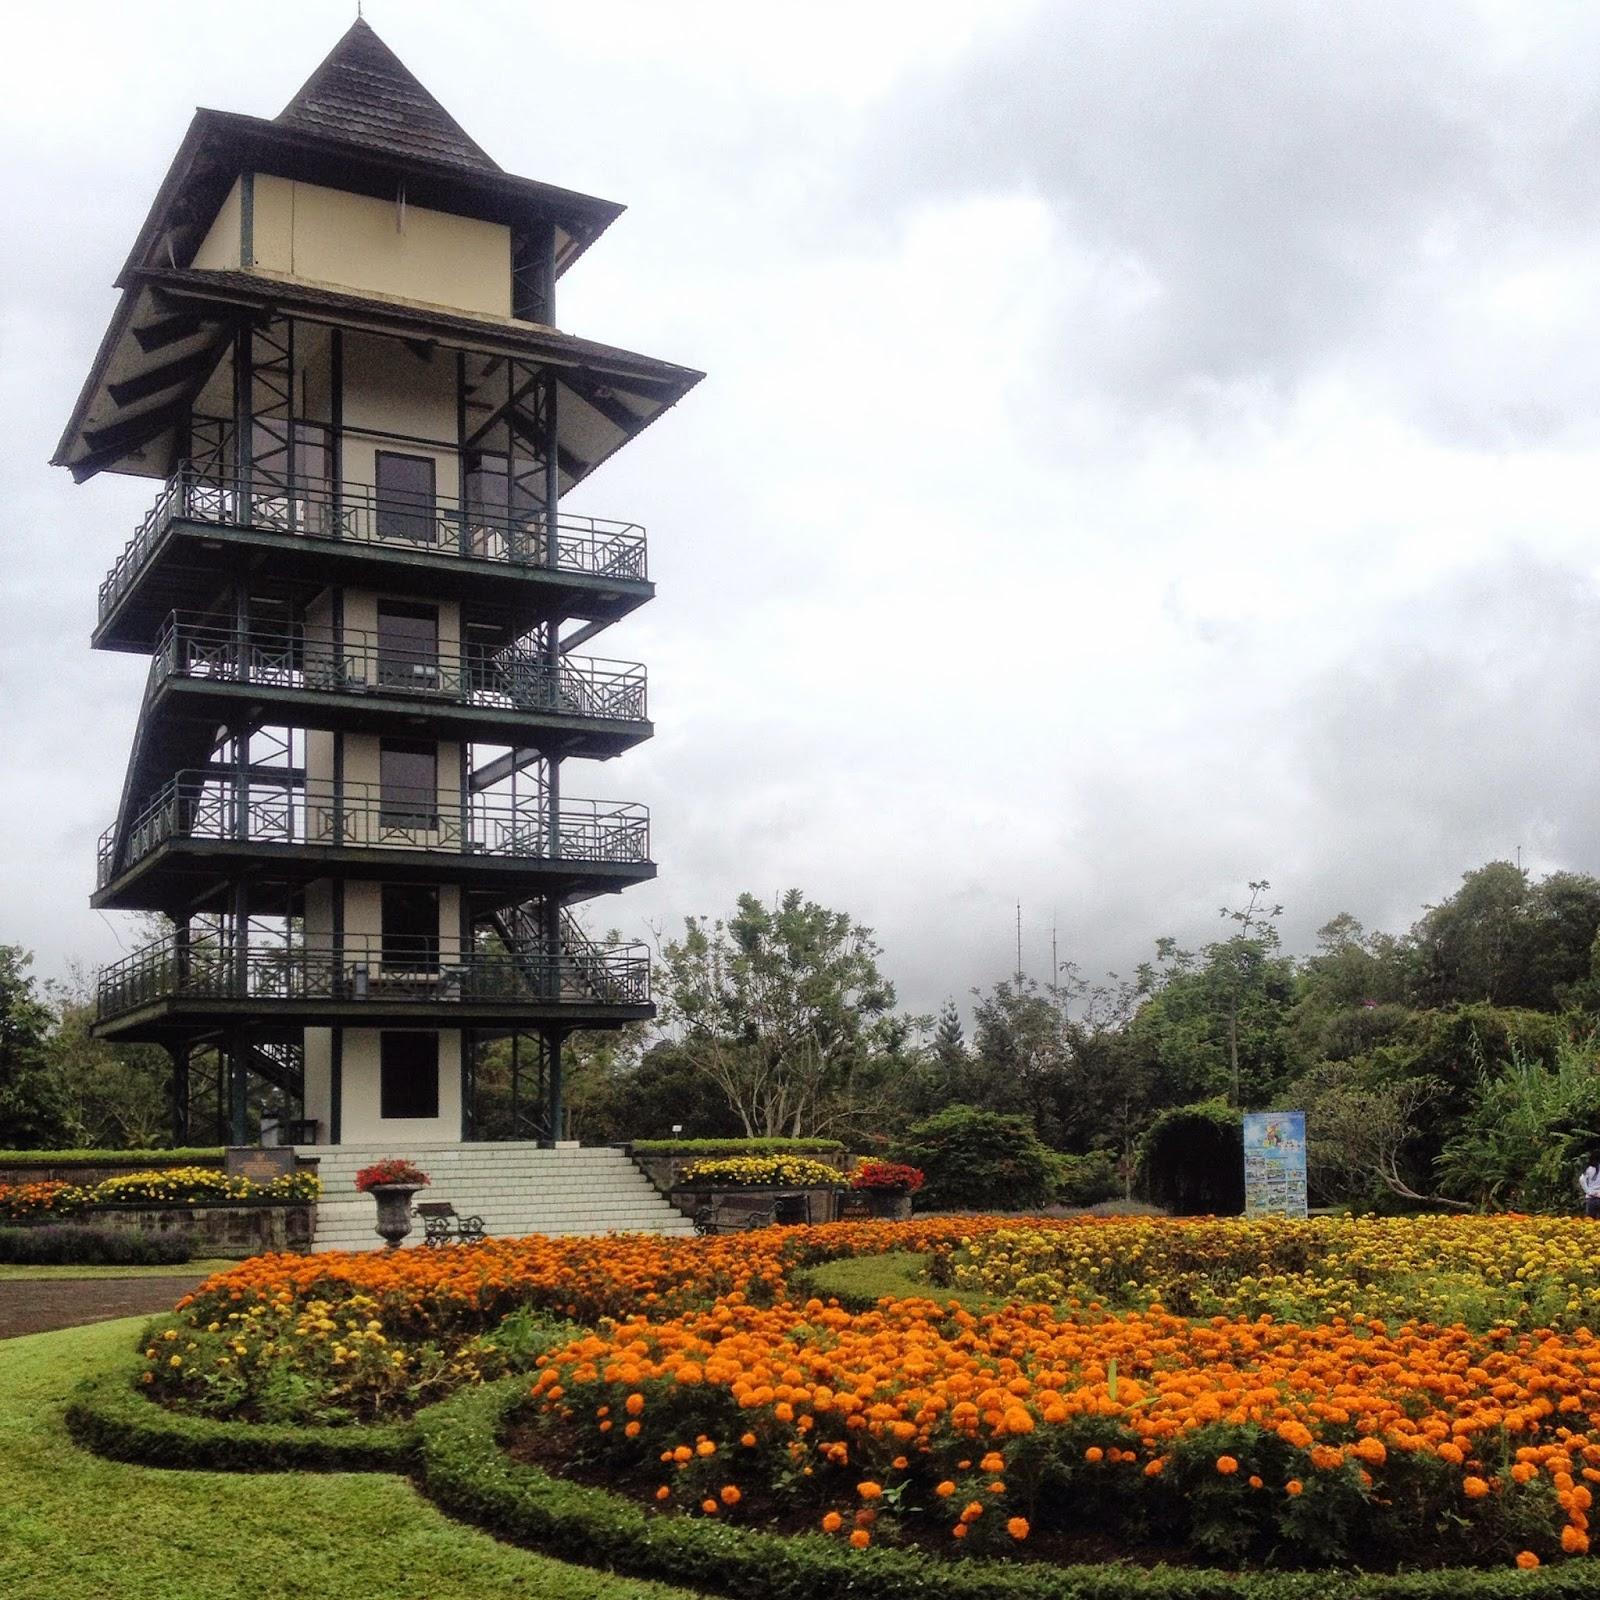 Taman Bunga Nusantara Taman Bunga Nusantara